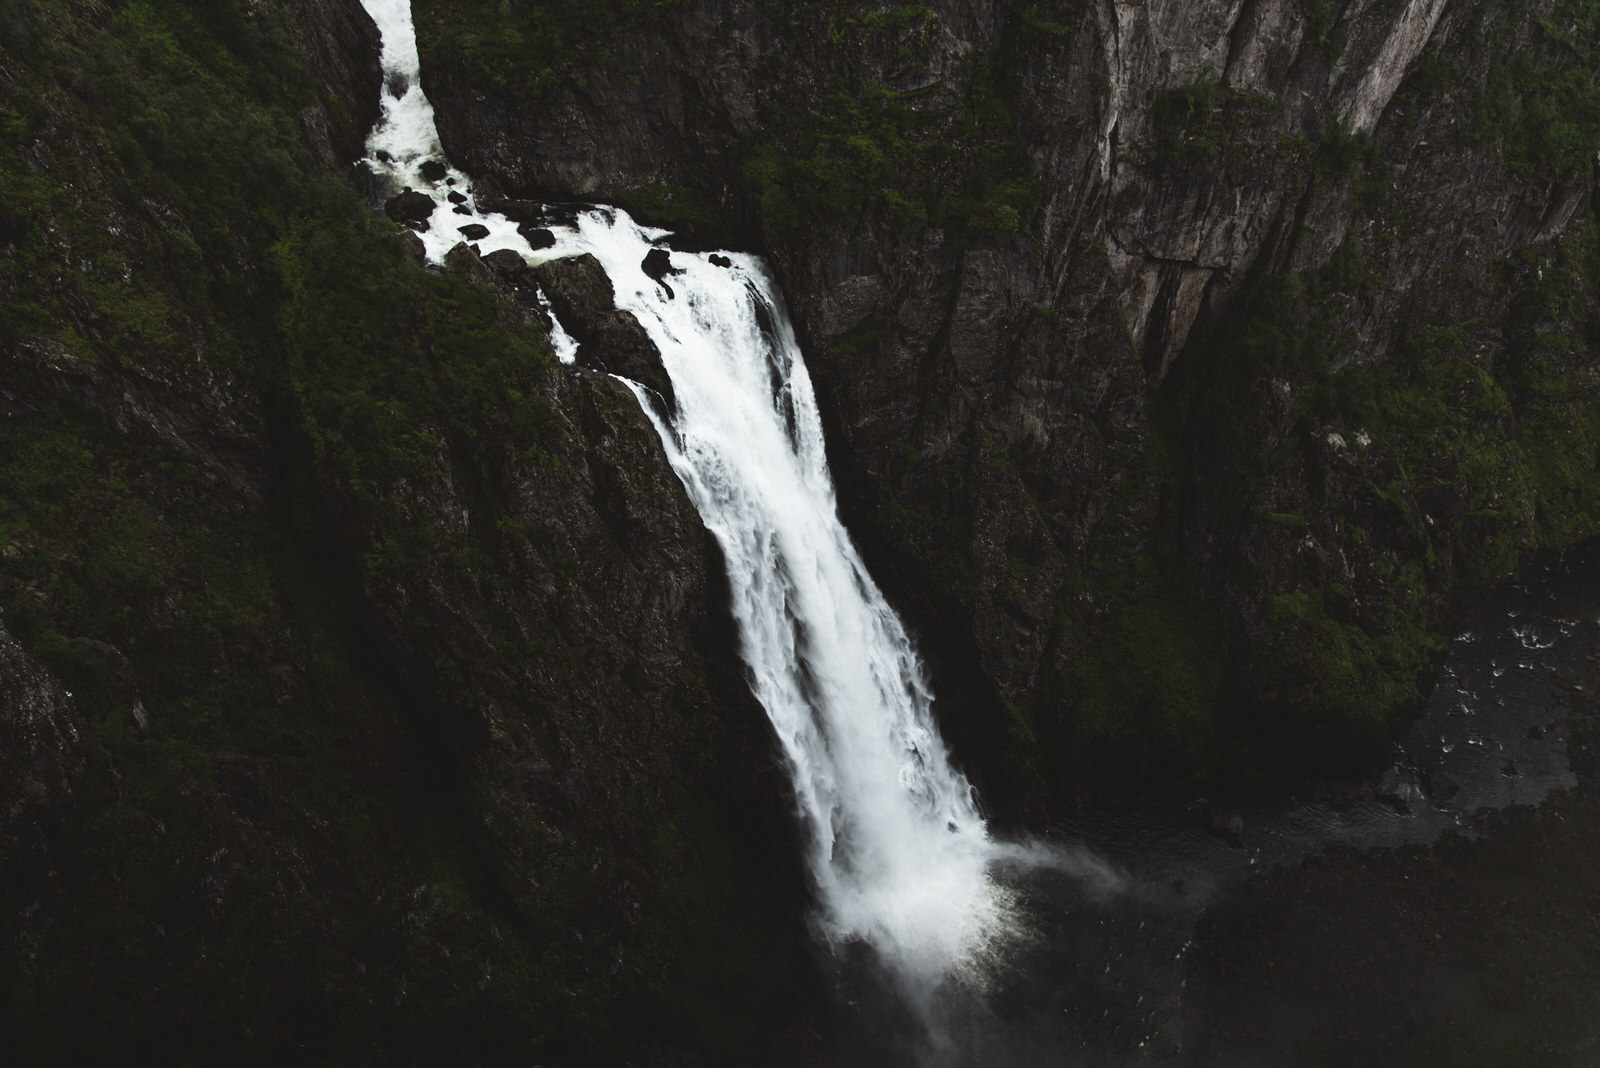 norway 2016 road trip part 7 hardangervidda voringsfossen